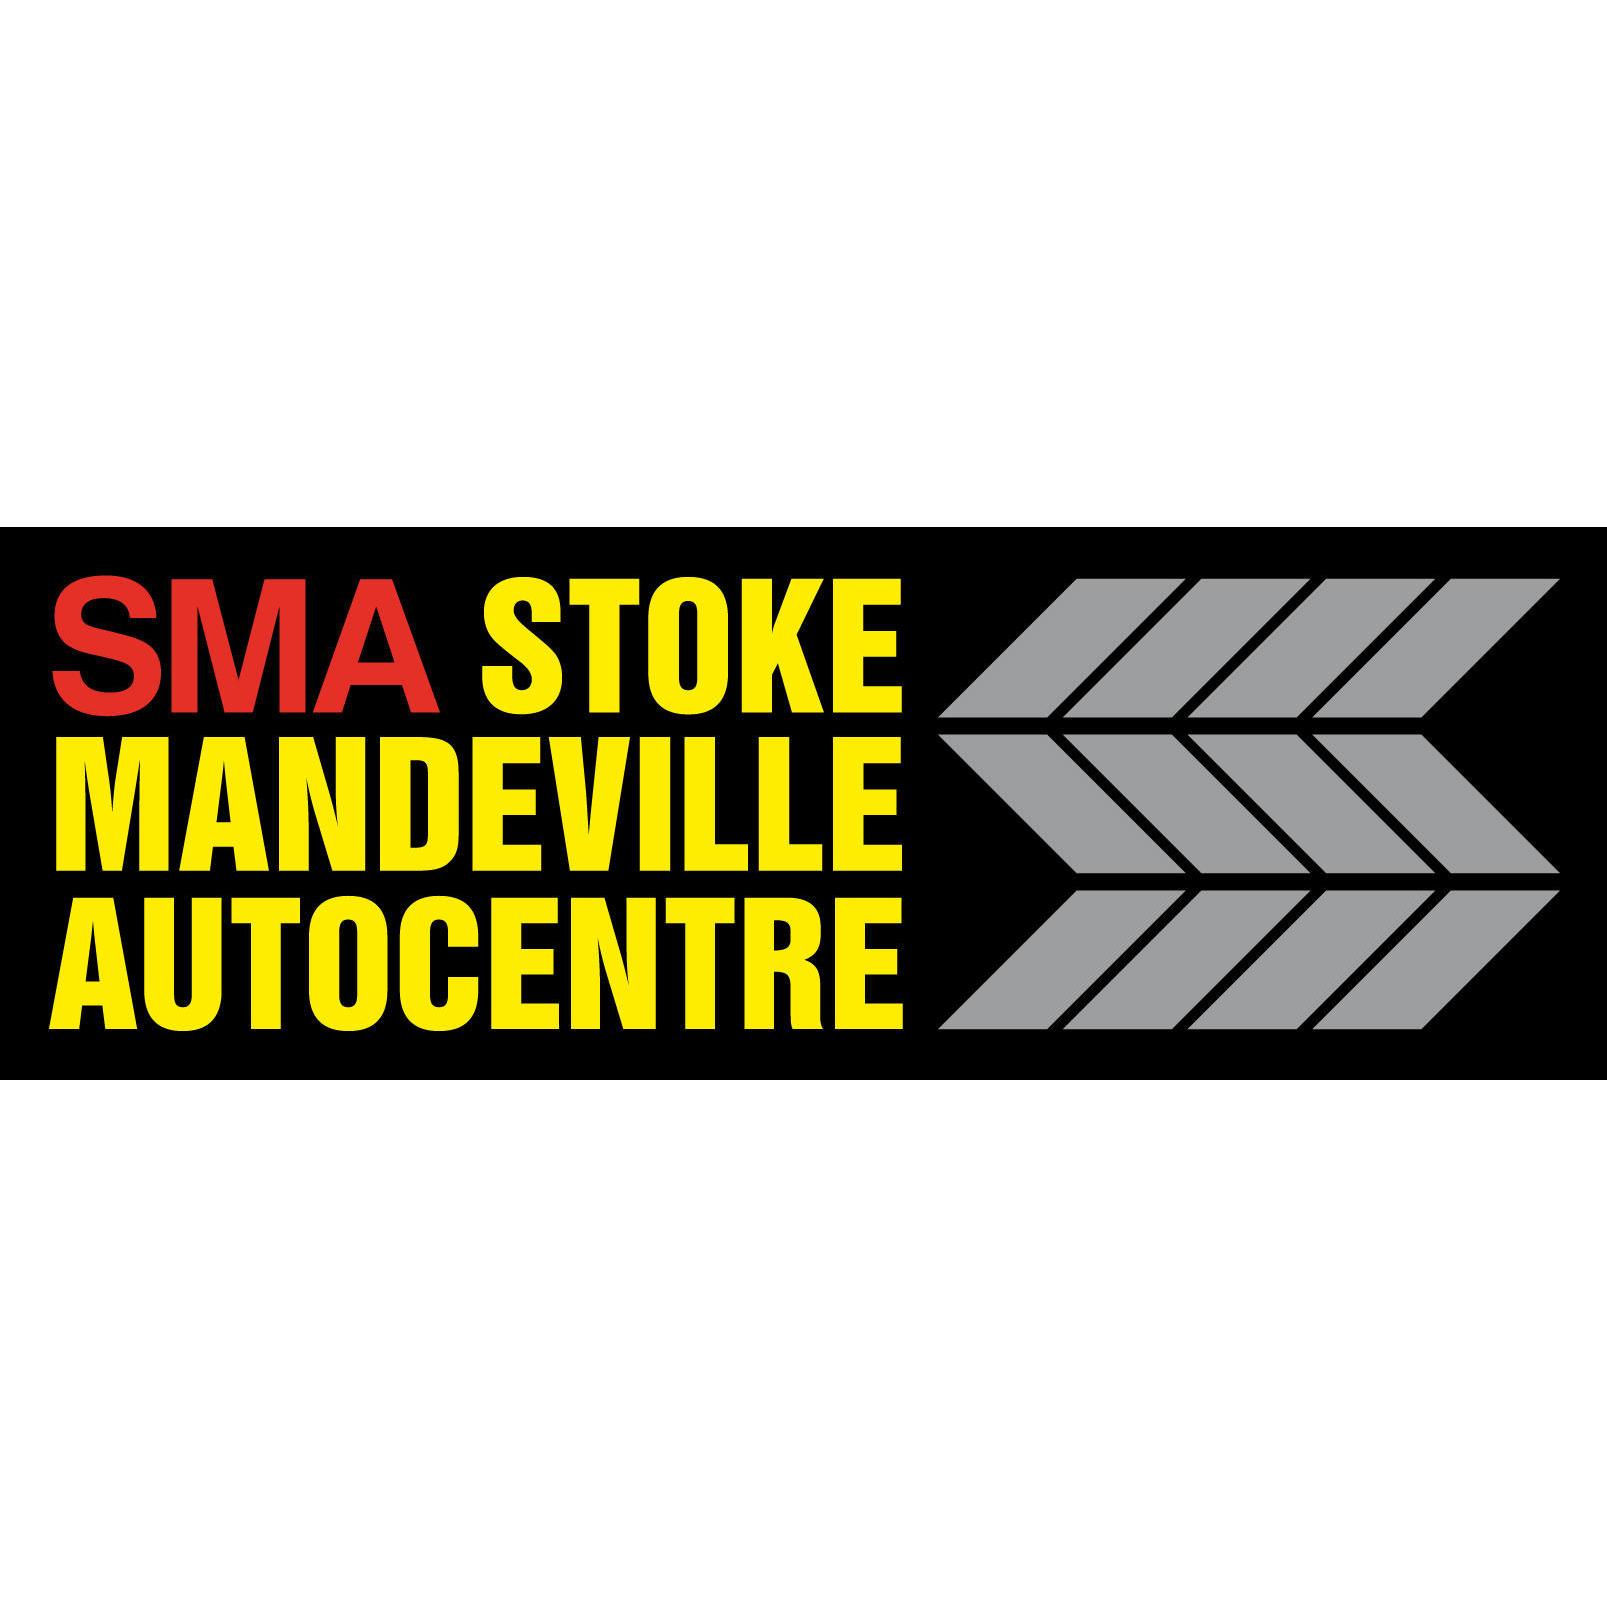 Stoke Mandeville Autocentre